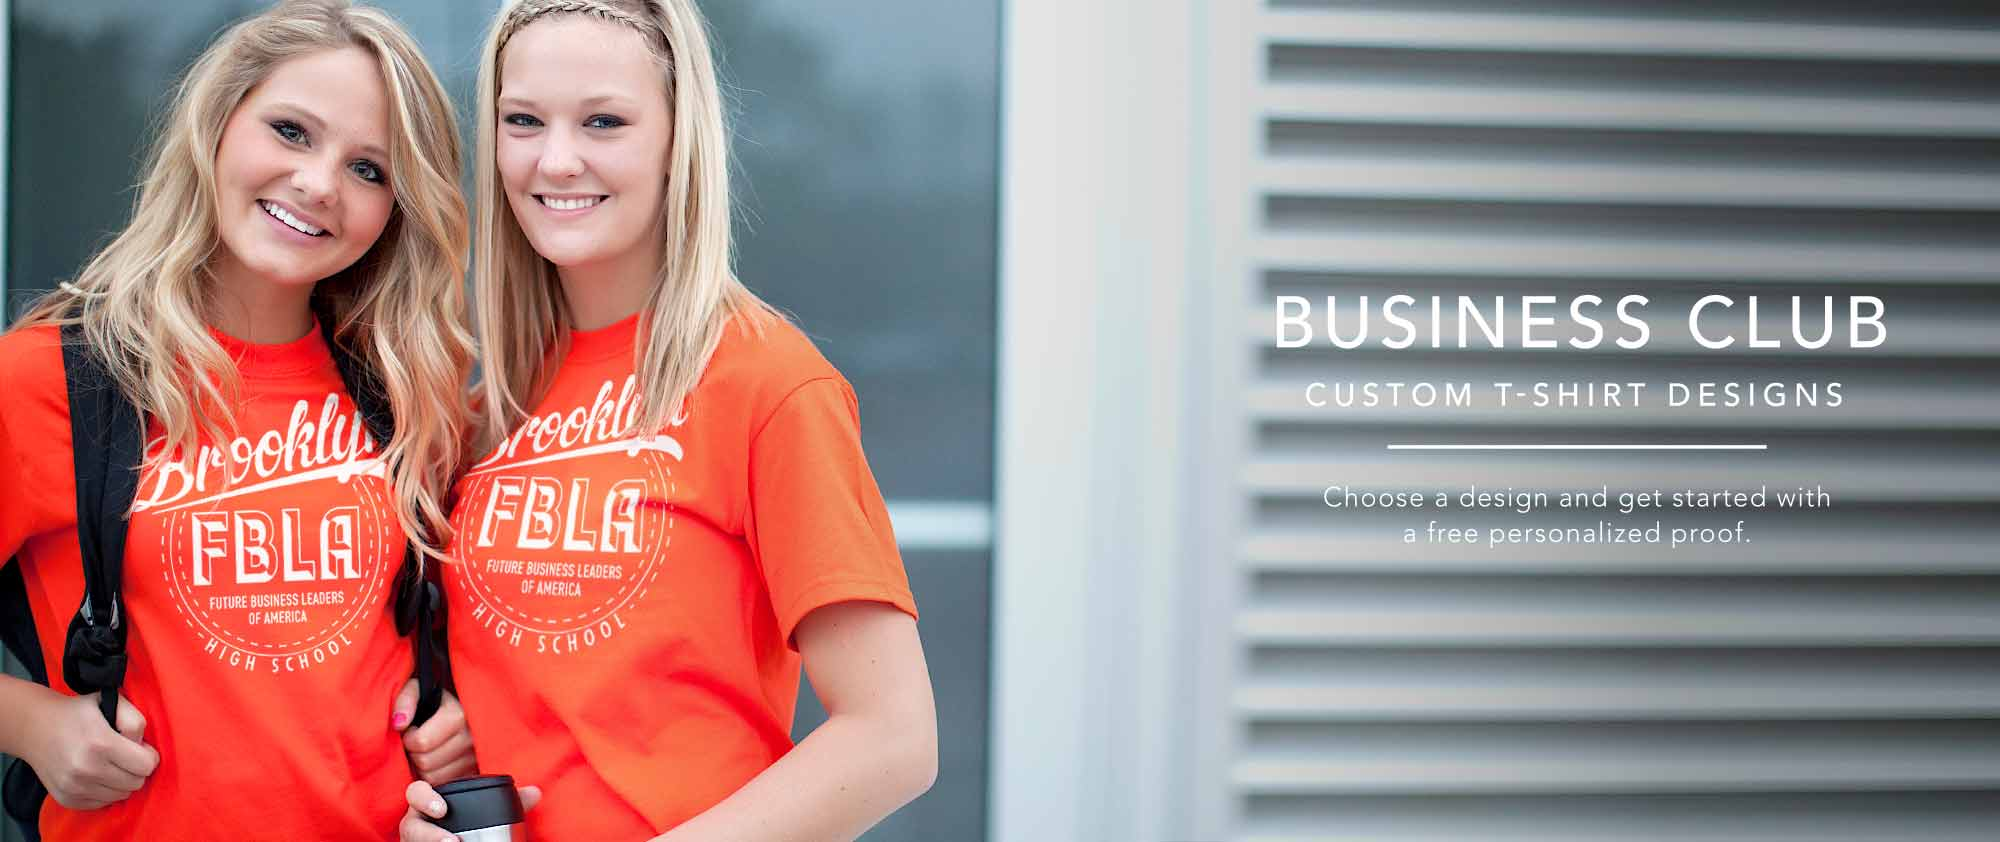 8e83d91c Image Market: Student Council T Shirts, Senior Custom T-Shirts, High School  Club TShirts - Choose a Design to Create Custom T-shirts for Any High School  ...